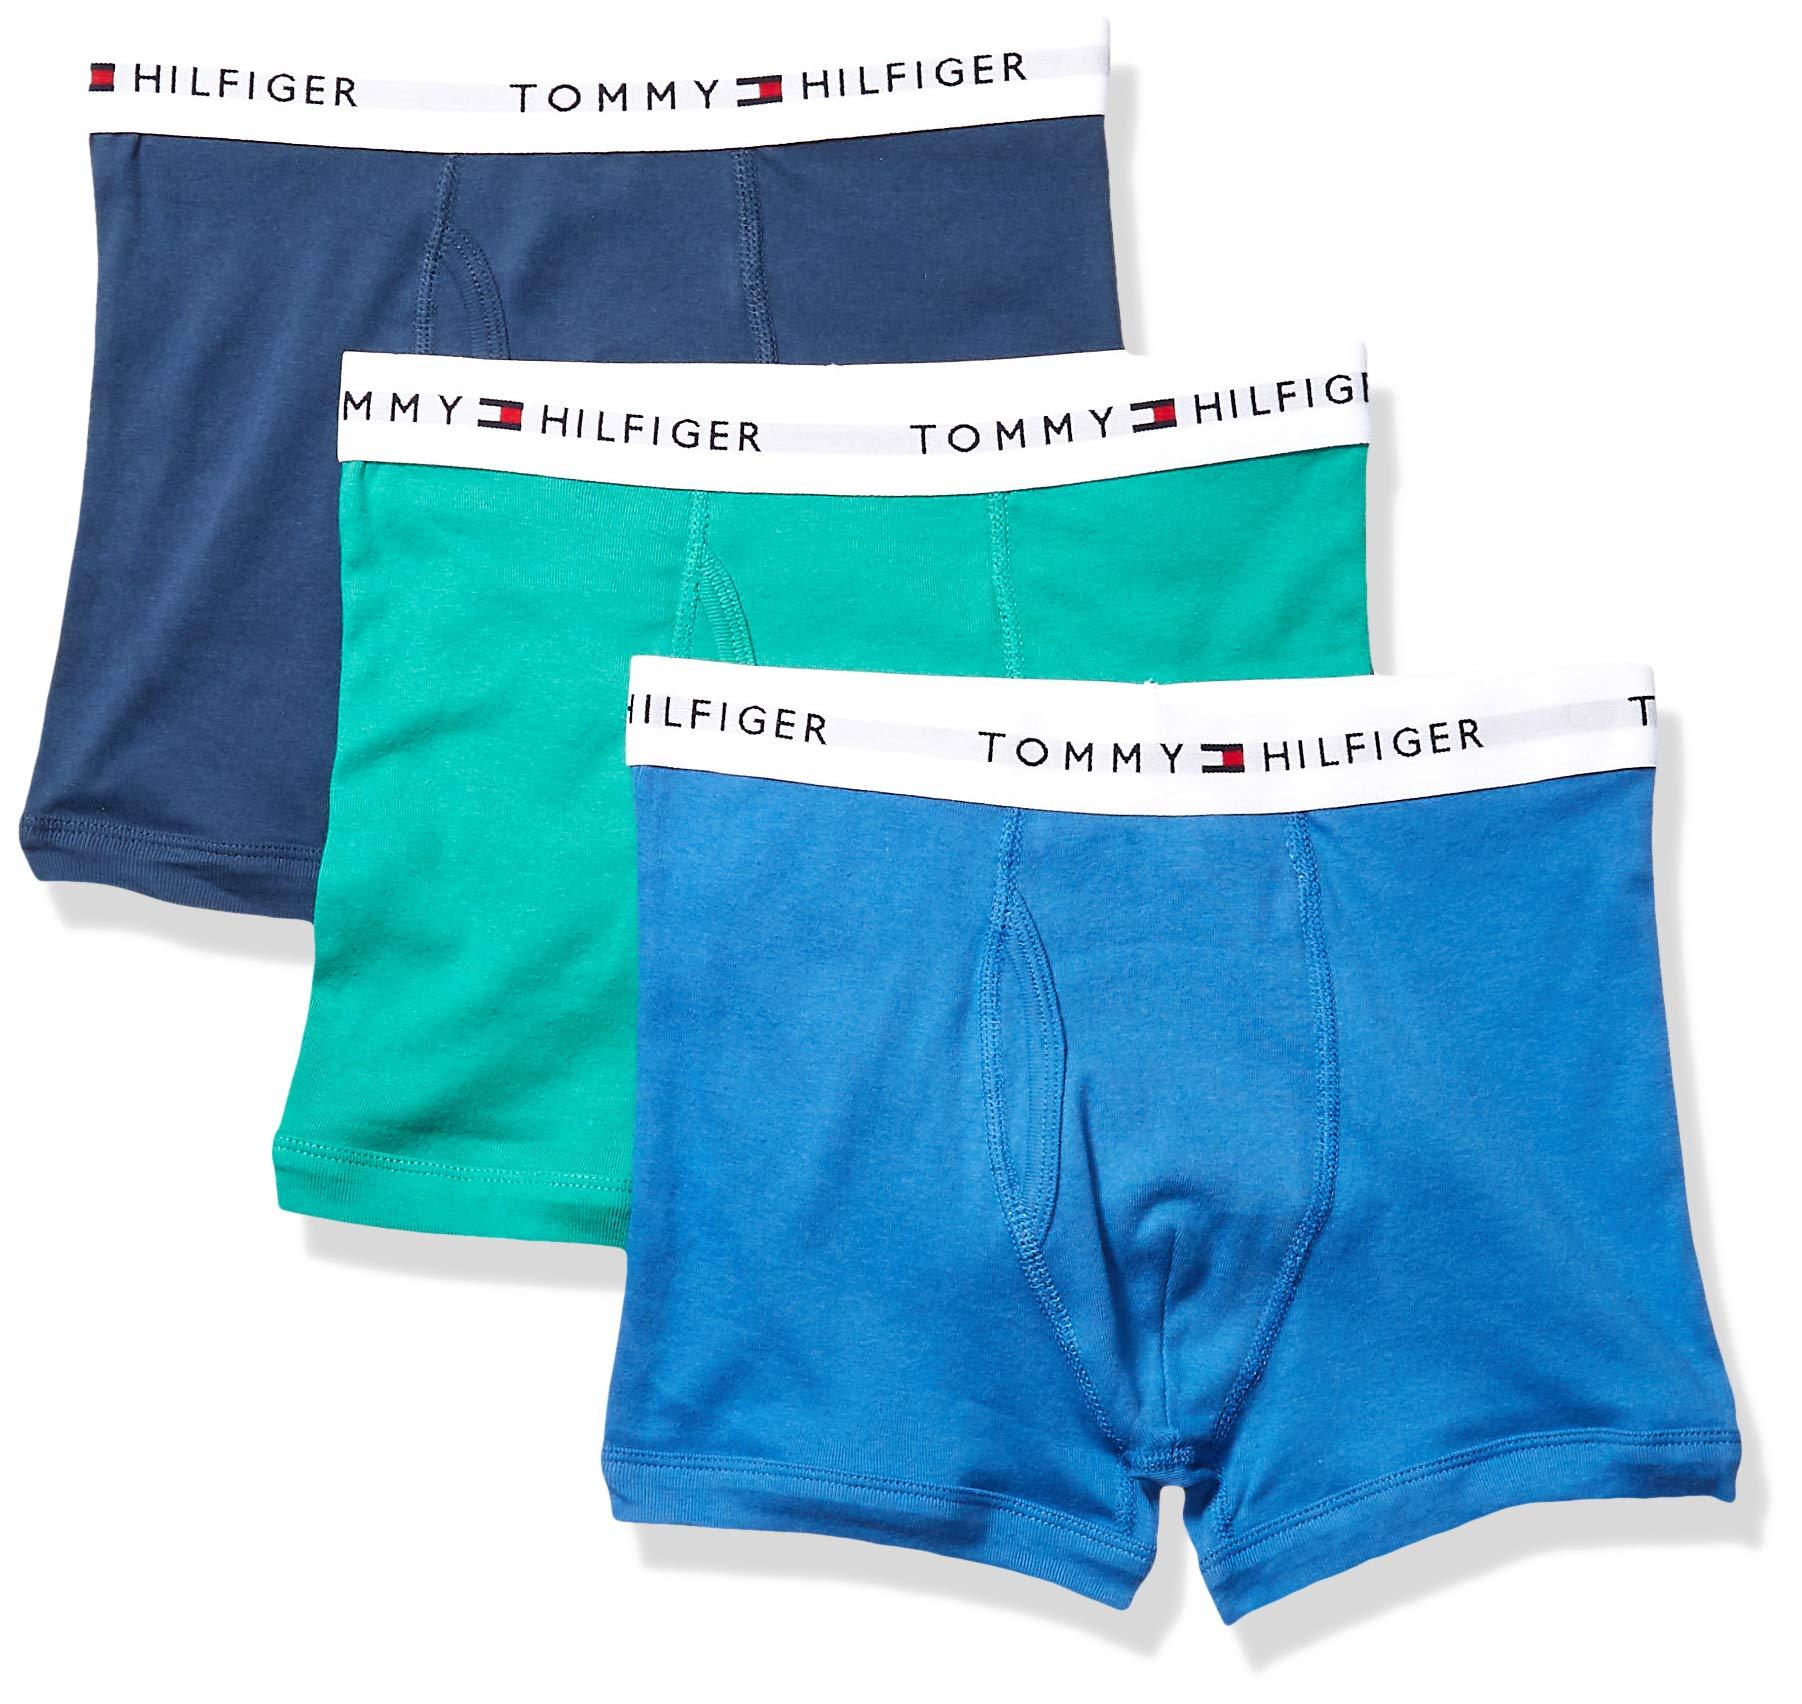 Tommy Hilfiger Men's Underwear Multipack Cotton Classics Trunks, Shamrock (Multi 3 Pack), M by Tommy Hilfiger